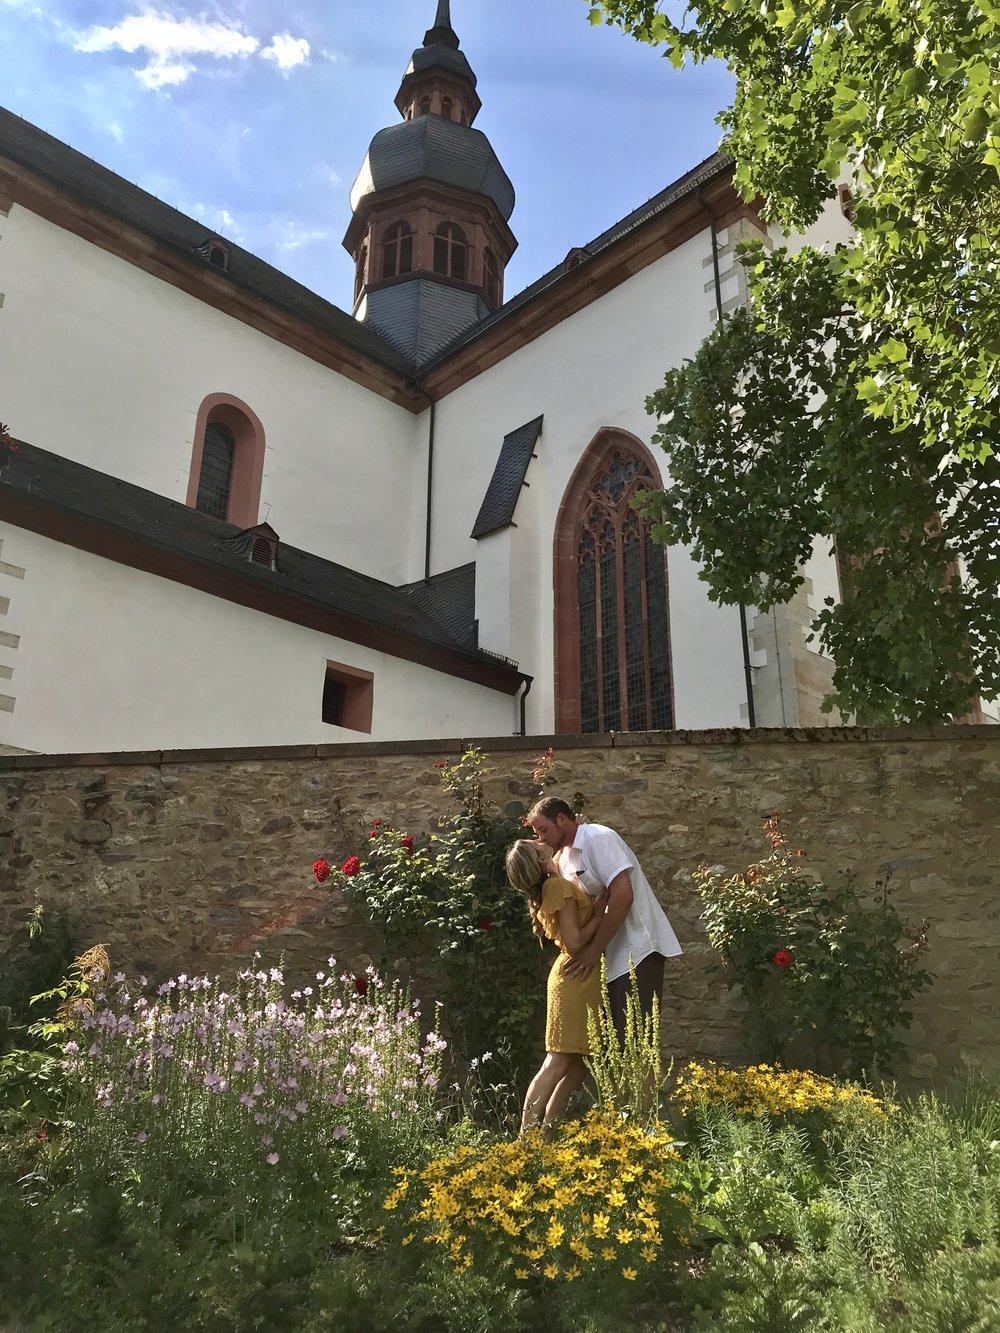 Kloster Eberbach kiss.jpg